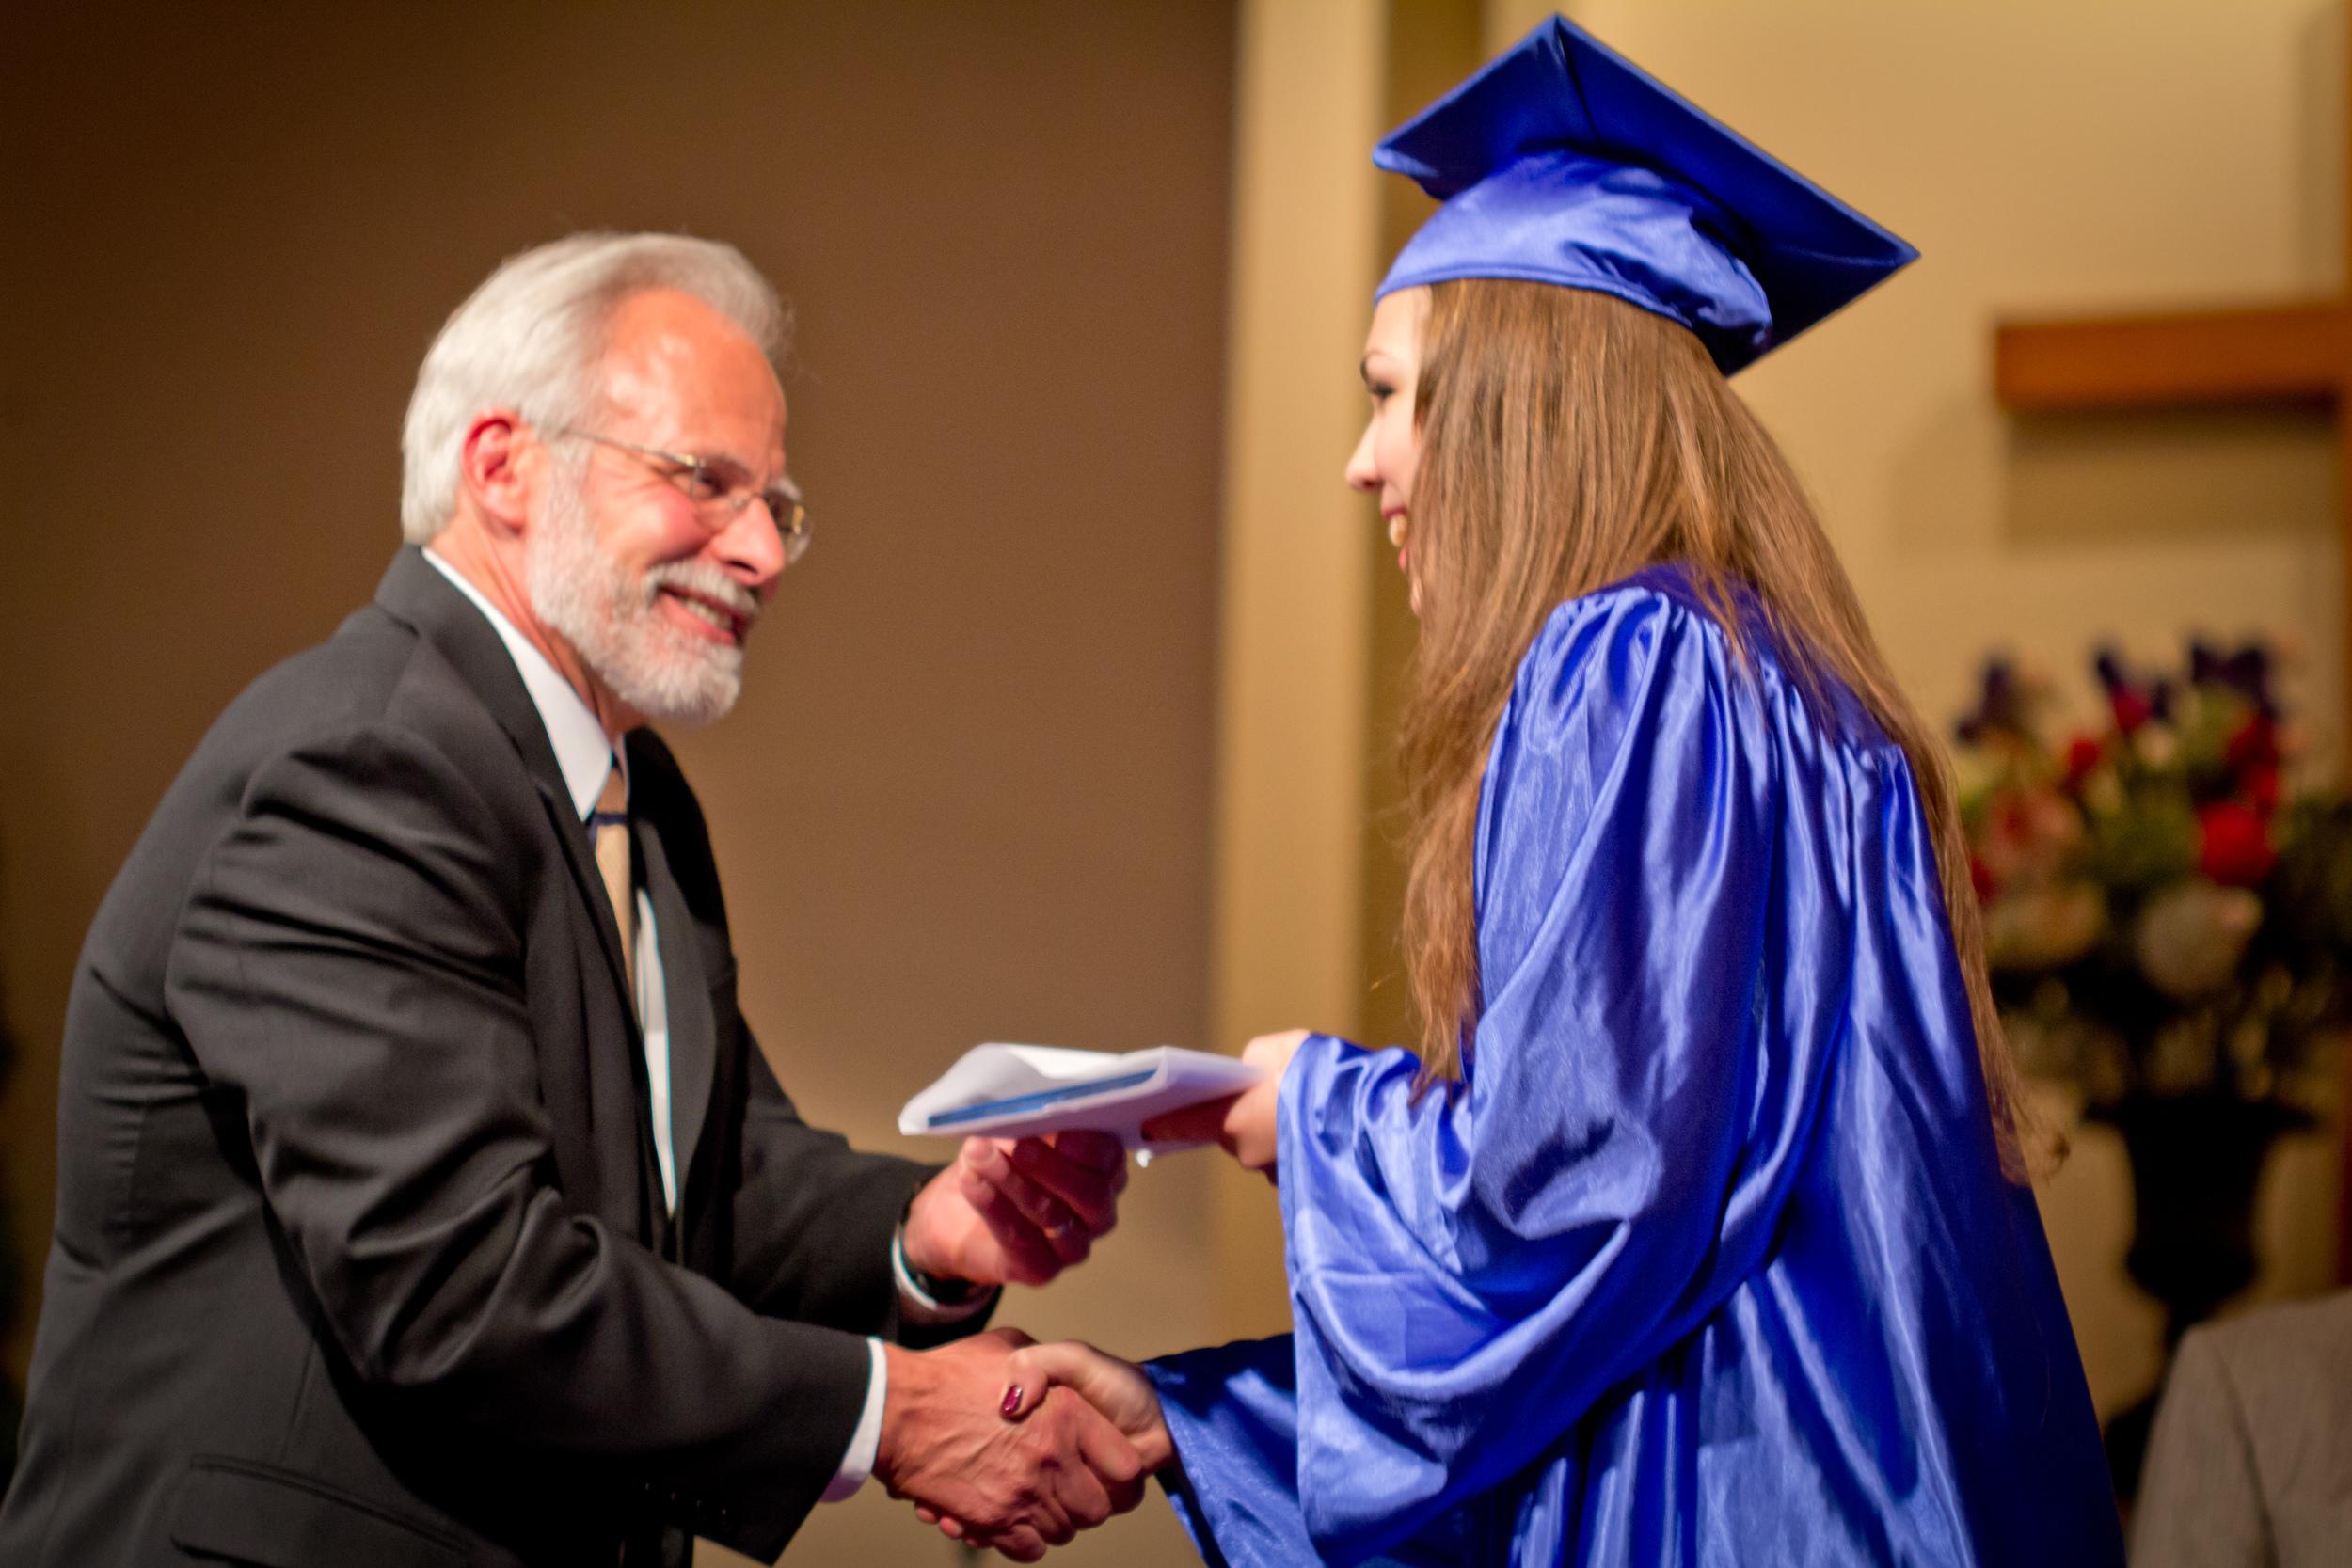 Mr Stutzman at high school graduation.